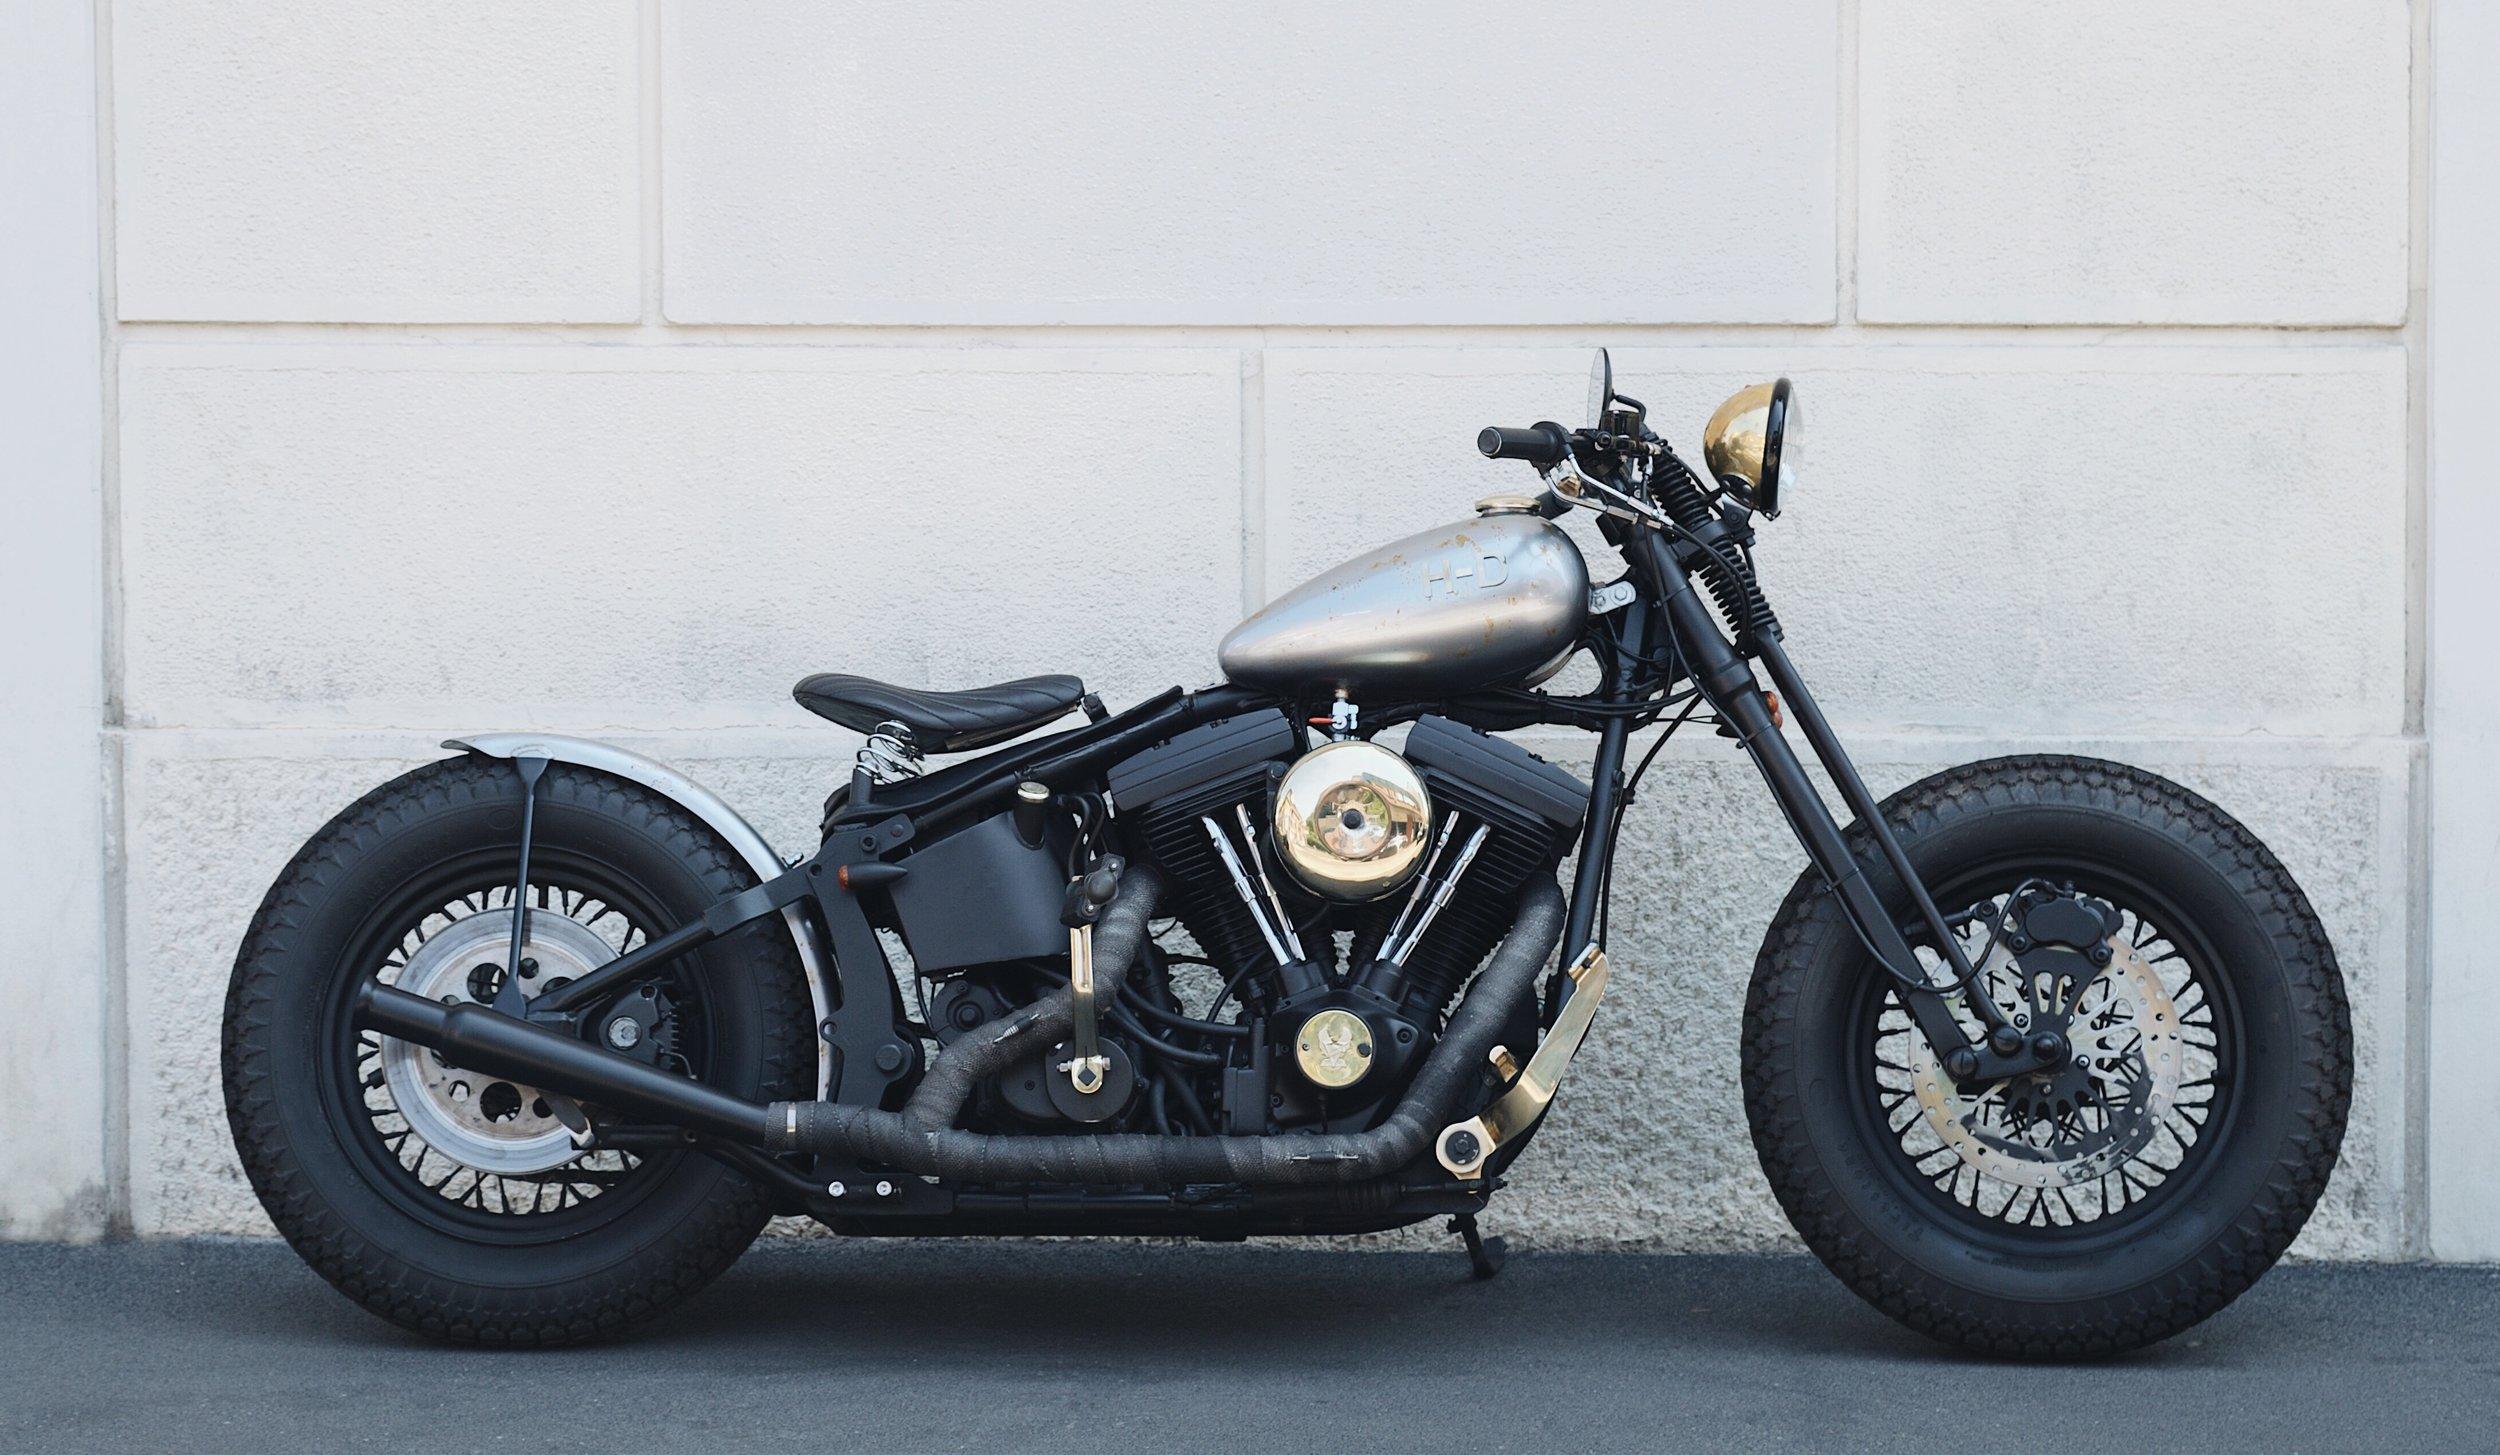 Marca: Harley Davidson Modello: Softail since 1984  0 77